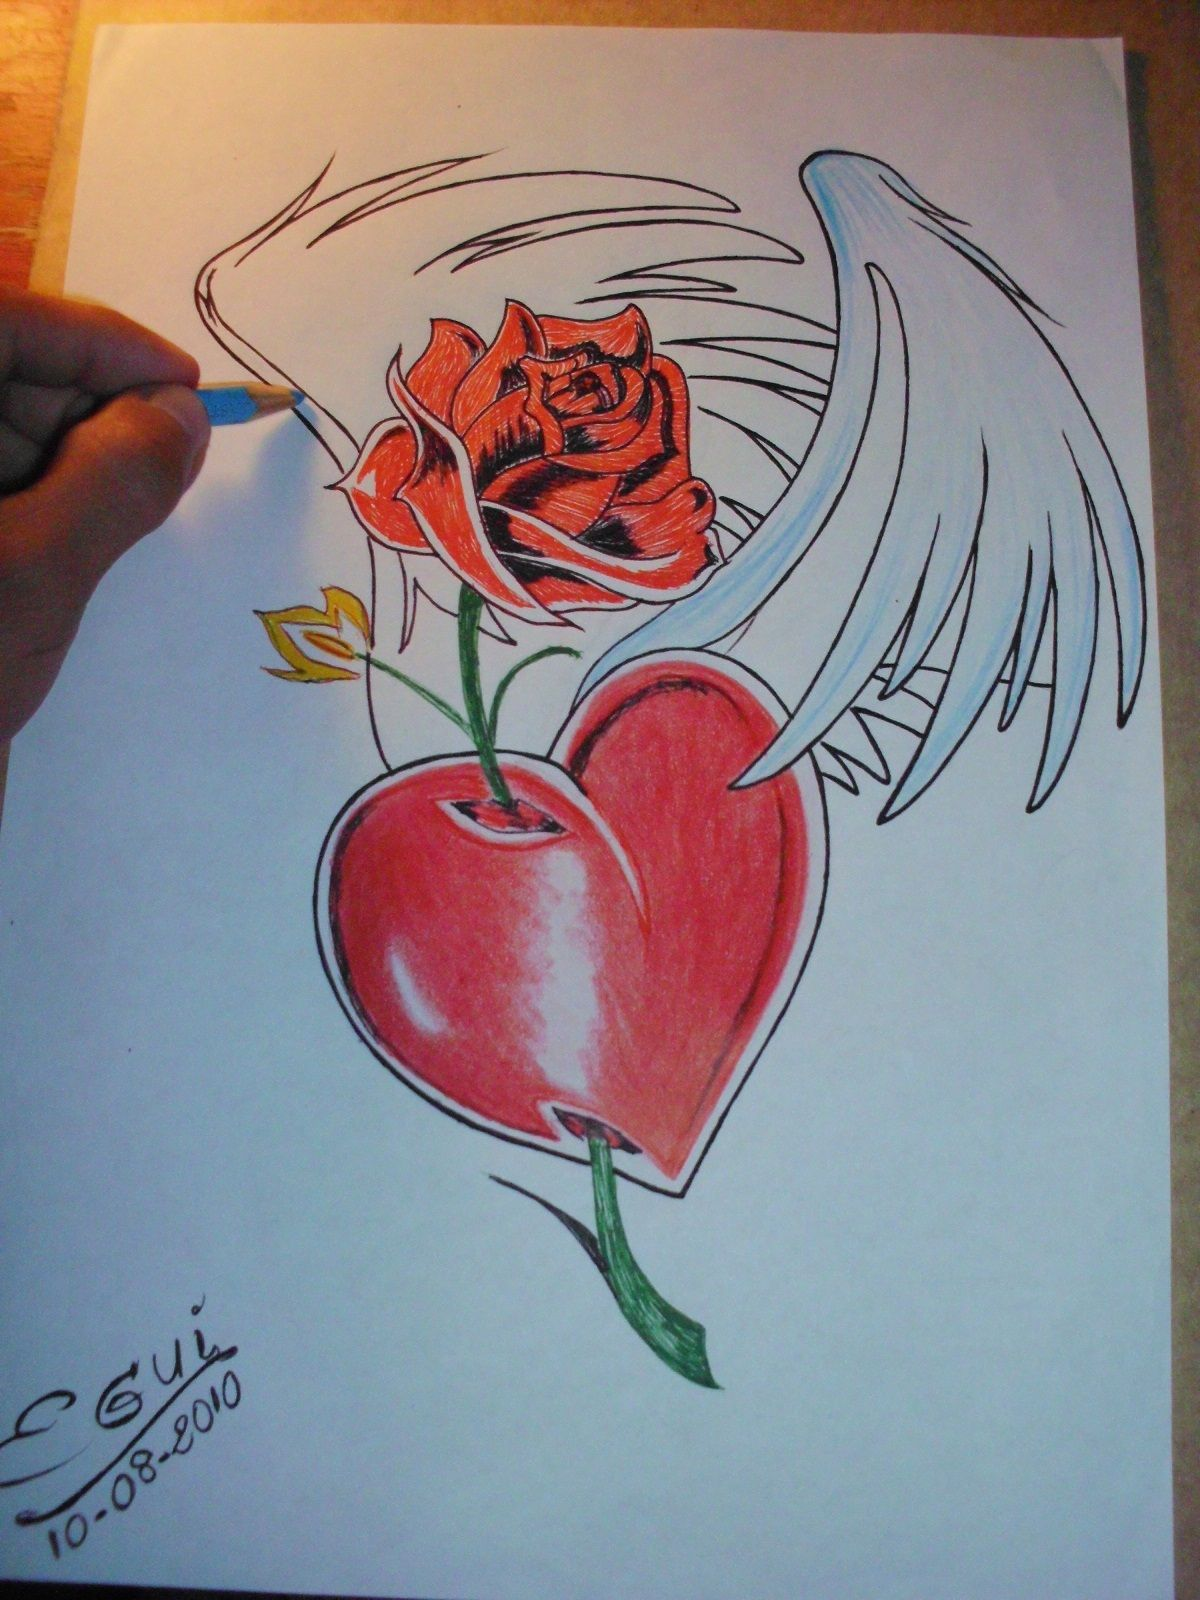 Pin Imagenes De Corazones Chidos Para Dibujar Tattoo On Pinterest ...